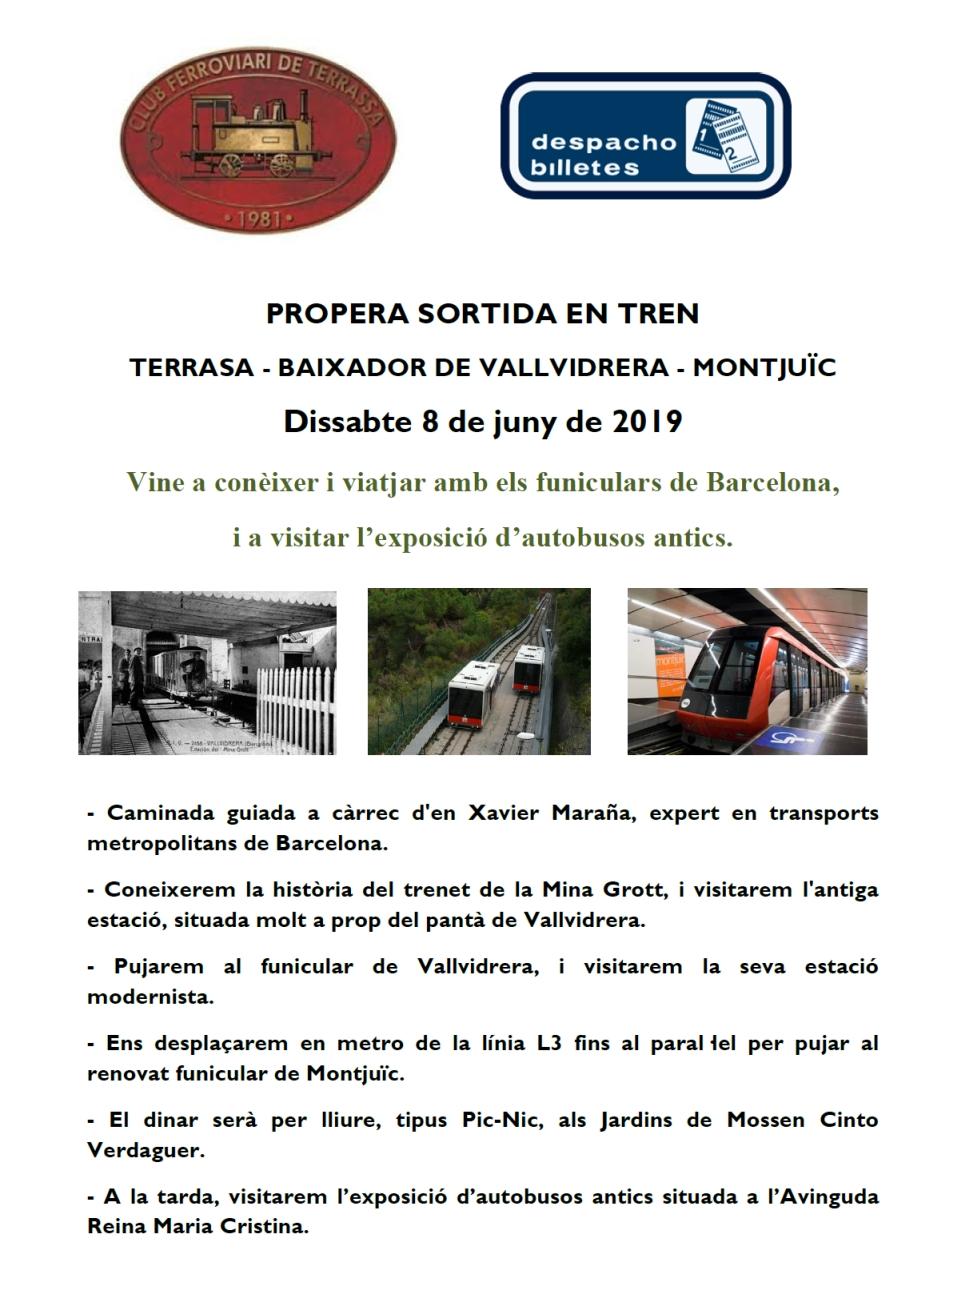 Propera Sortida en Tren: Terrassa – Baixador de Vallvidrera – Montjuïc.